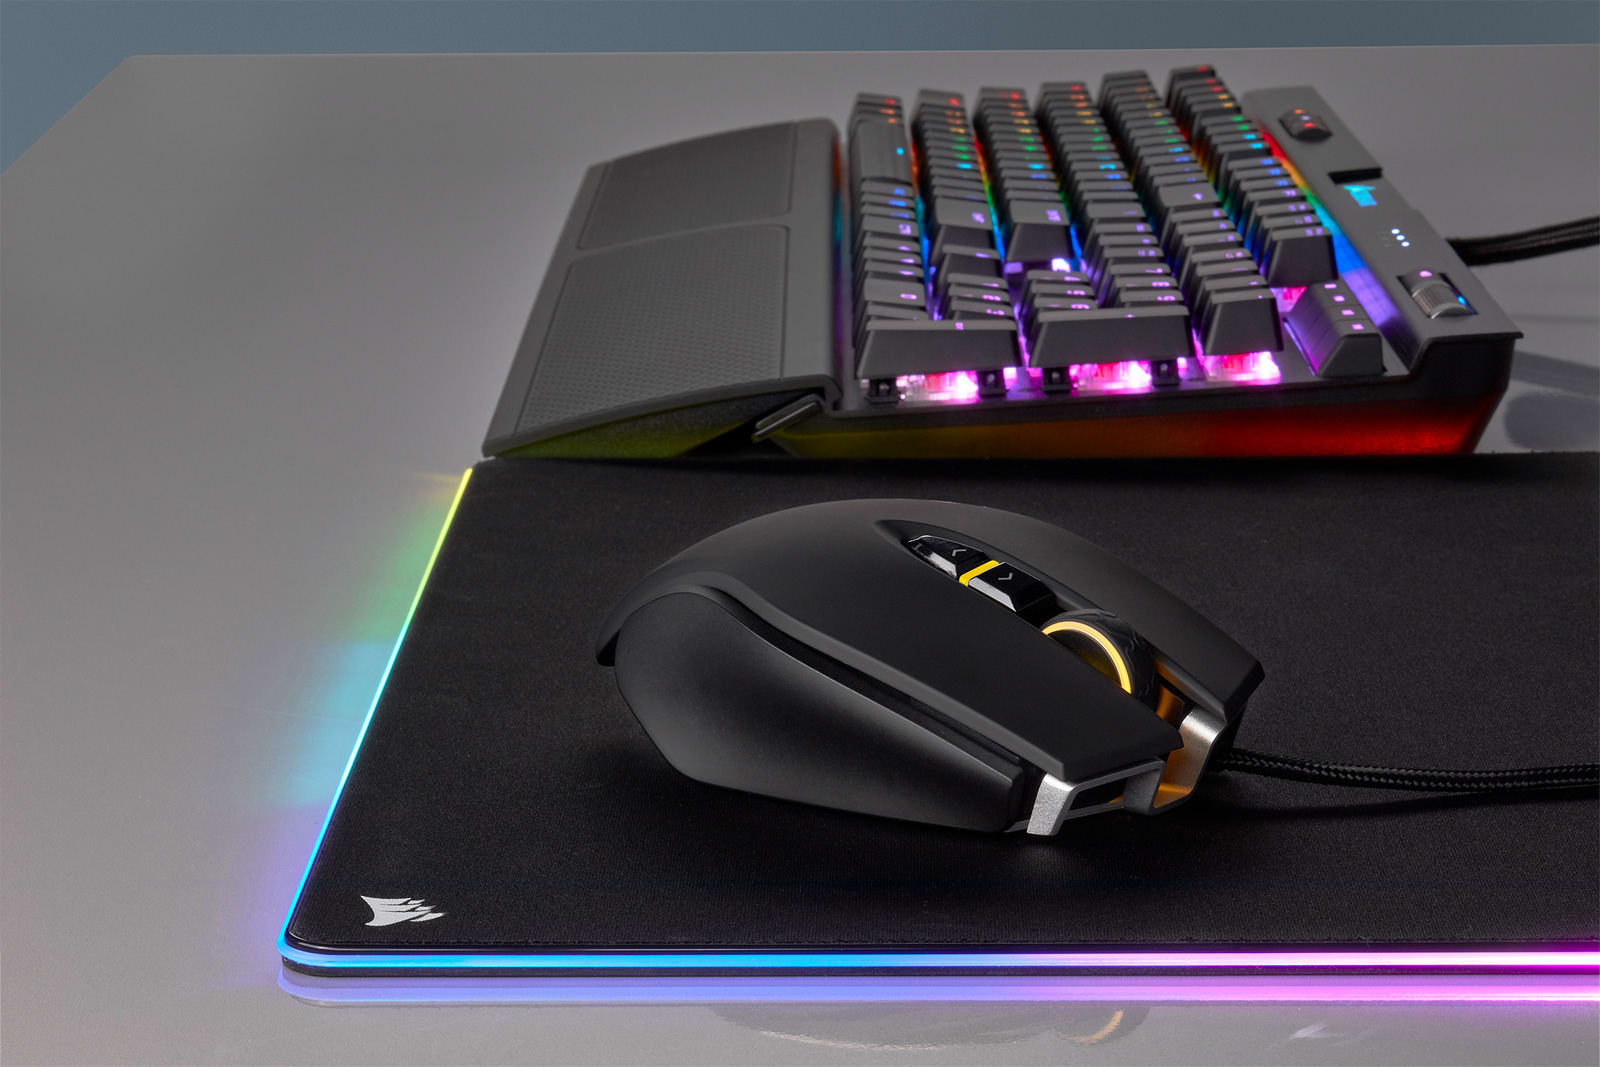 Corsair M65 RGB Elite gaming mouse